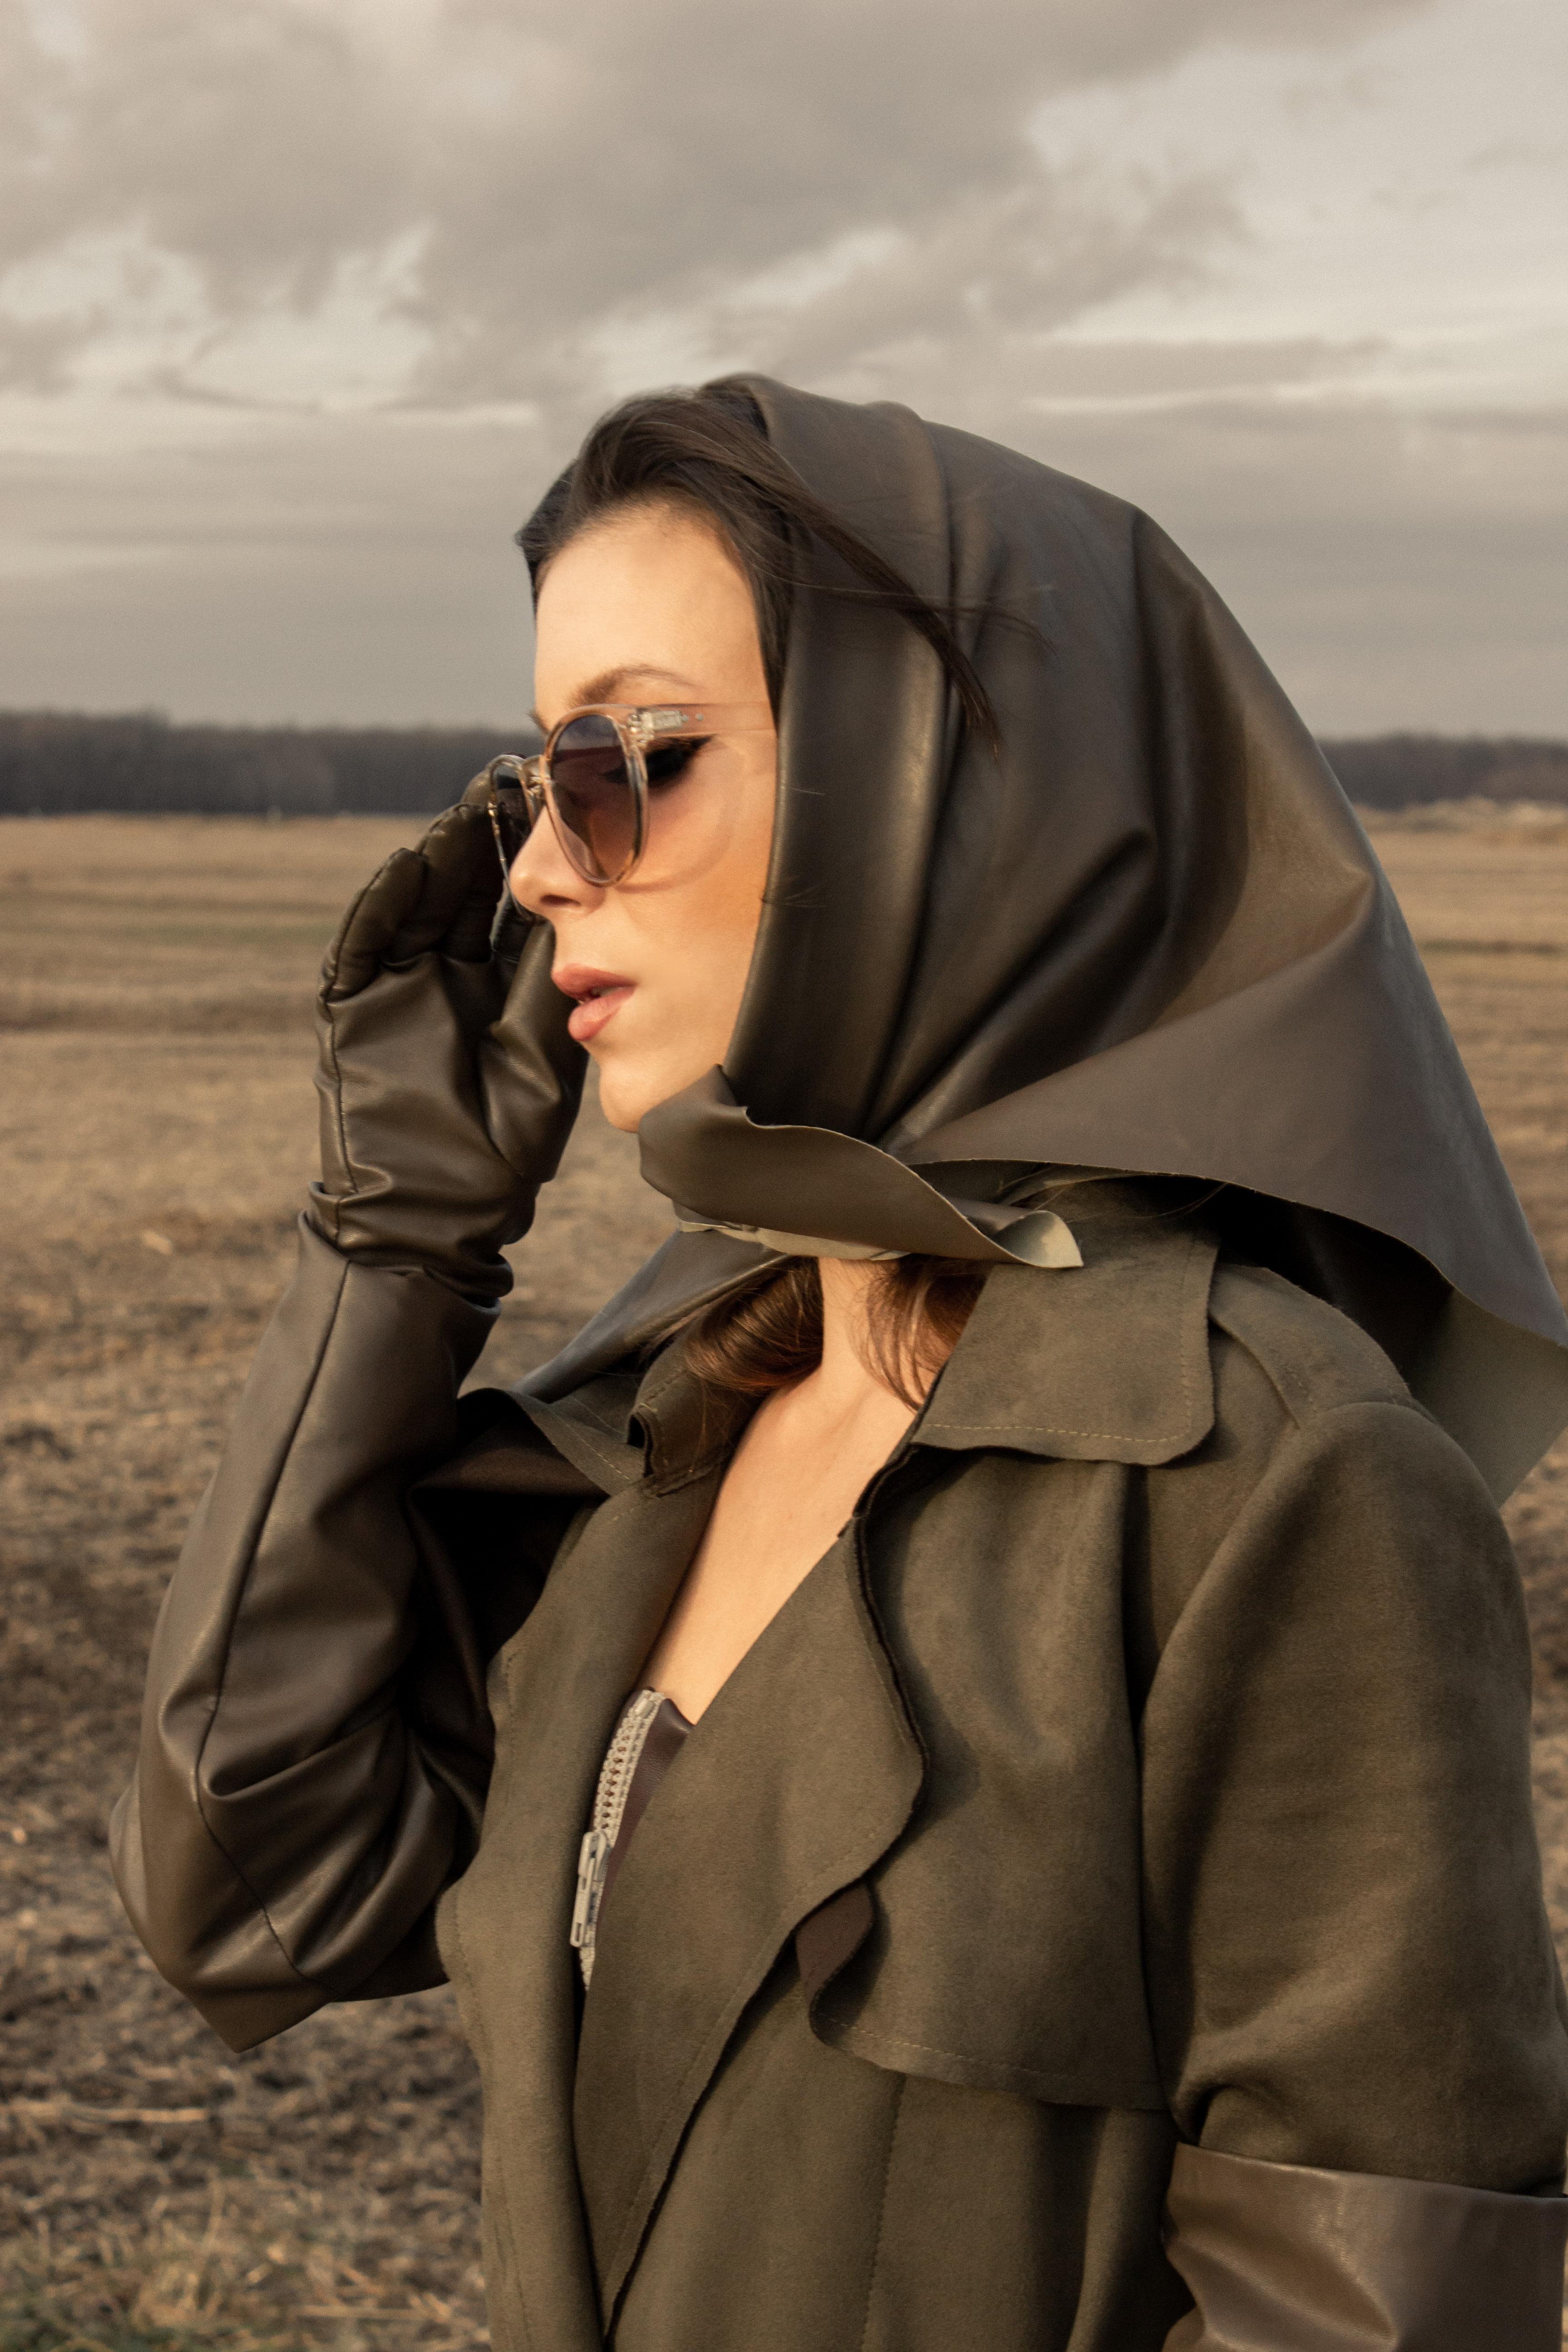 Woman wearing faux leather babushka head scarf in cedar brown